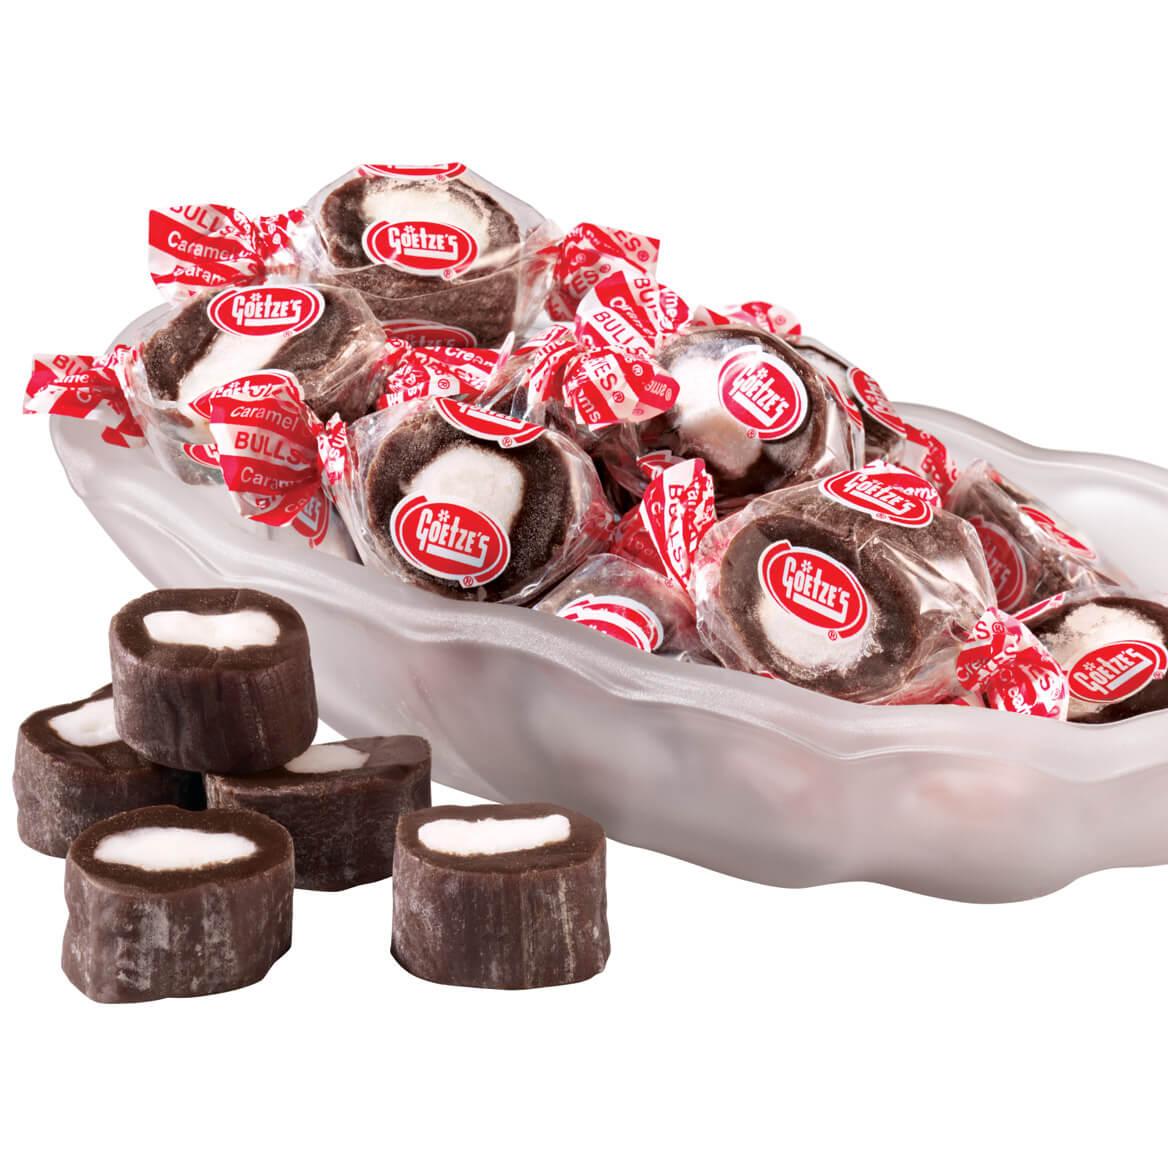 Chocolate Caramel Creams ® 11.5 oz.-343545